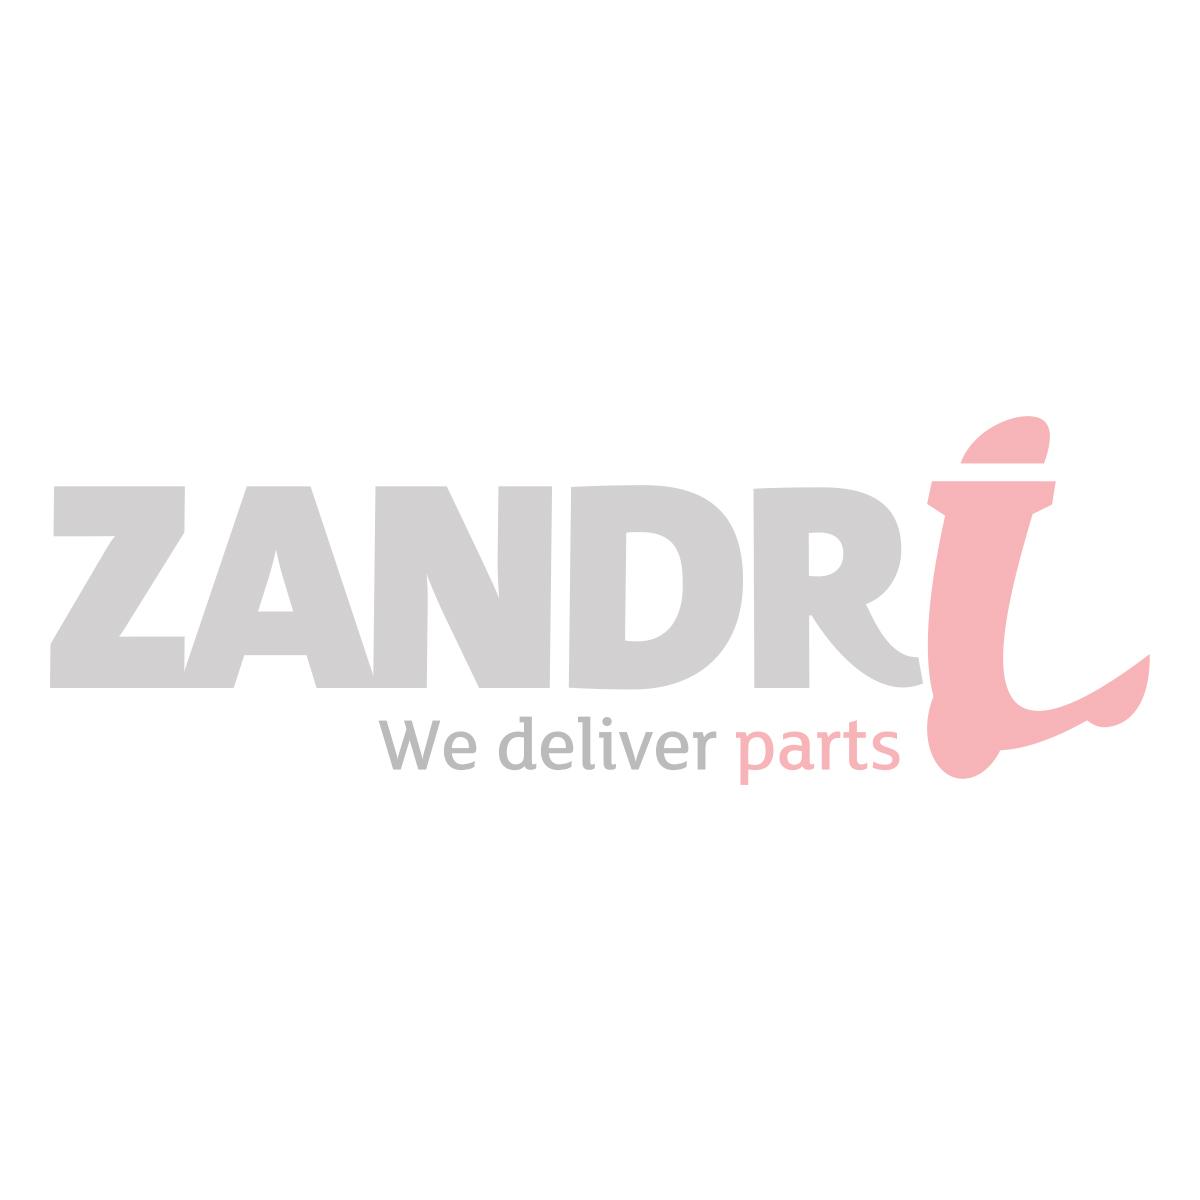 Carburateur- Luchtfilter Peugeot Speedfight 2 AC E2 2-Takt